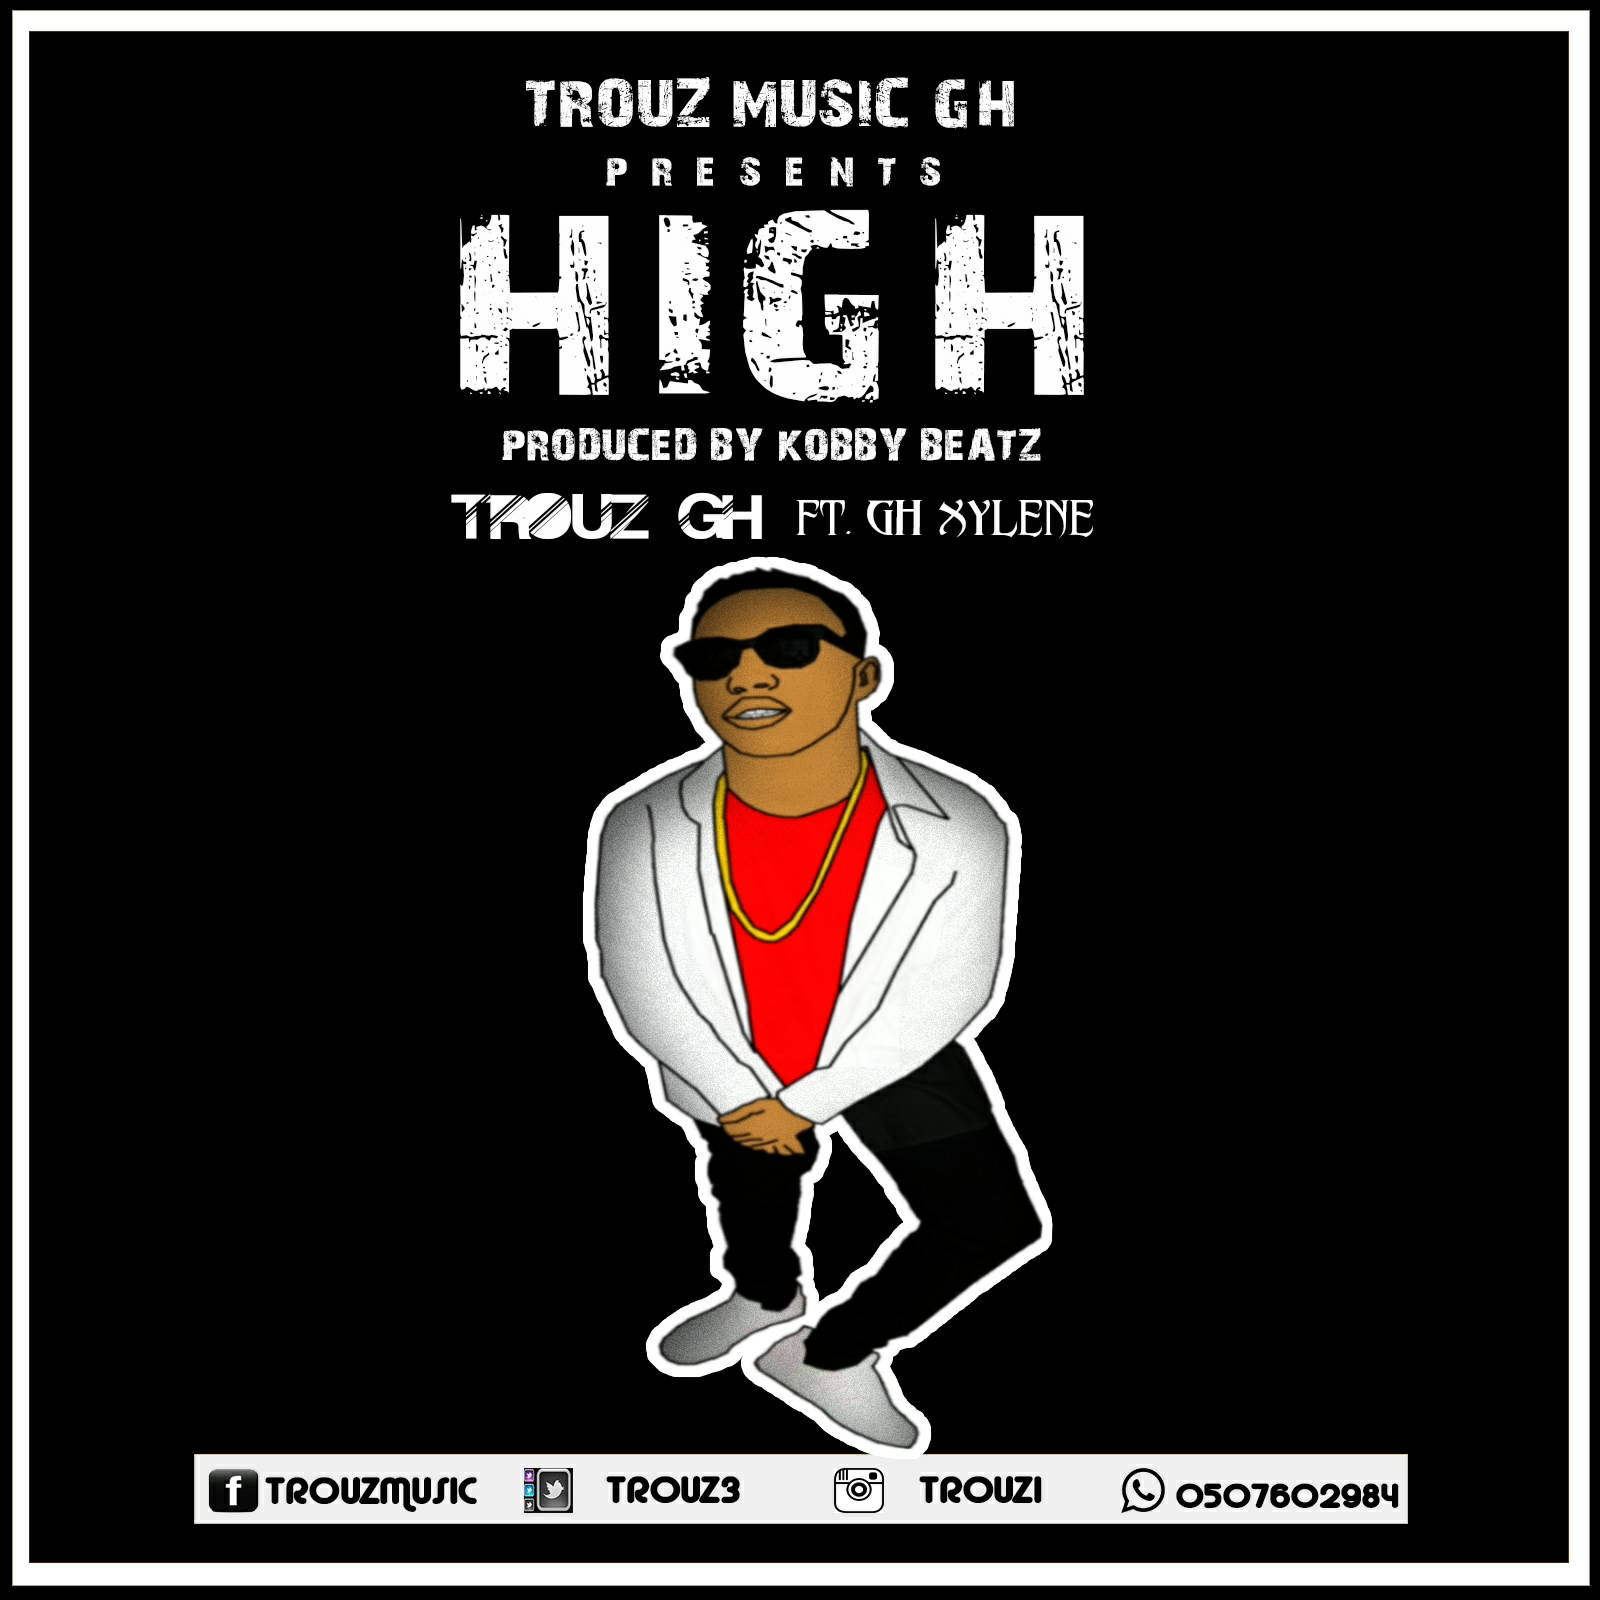 Trouz High Ft